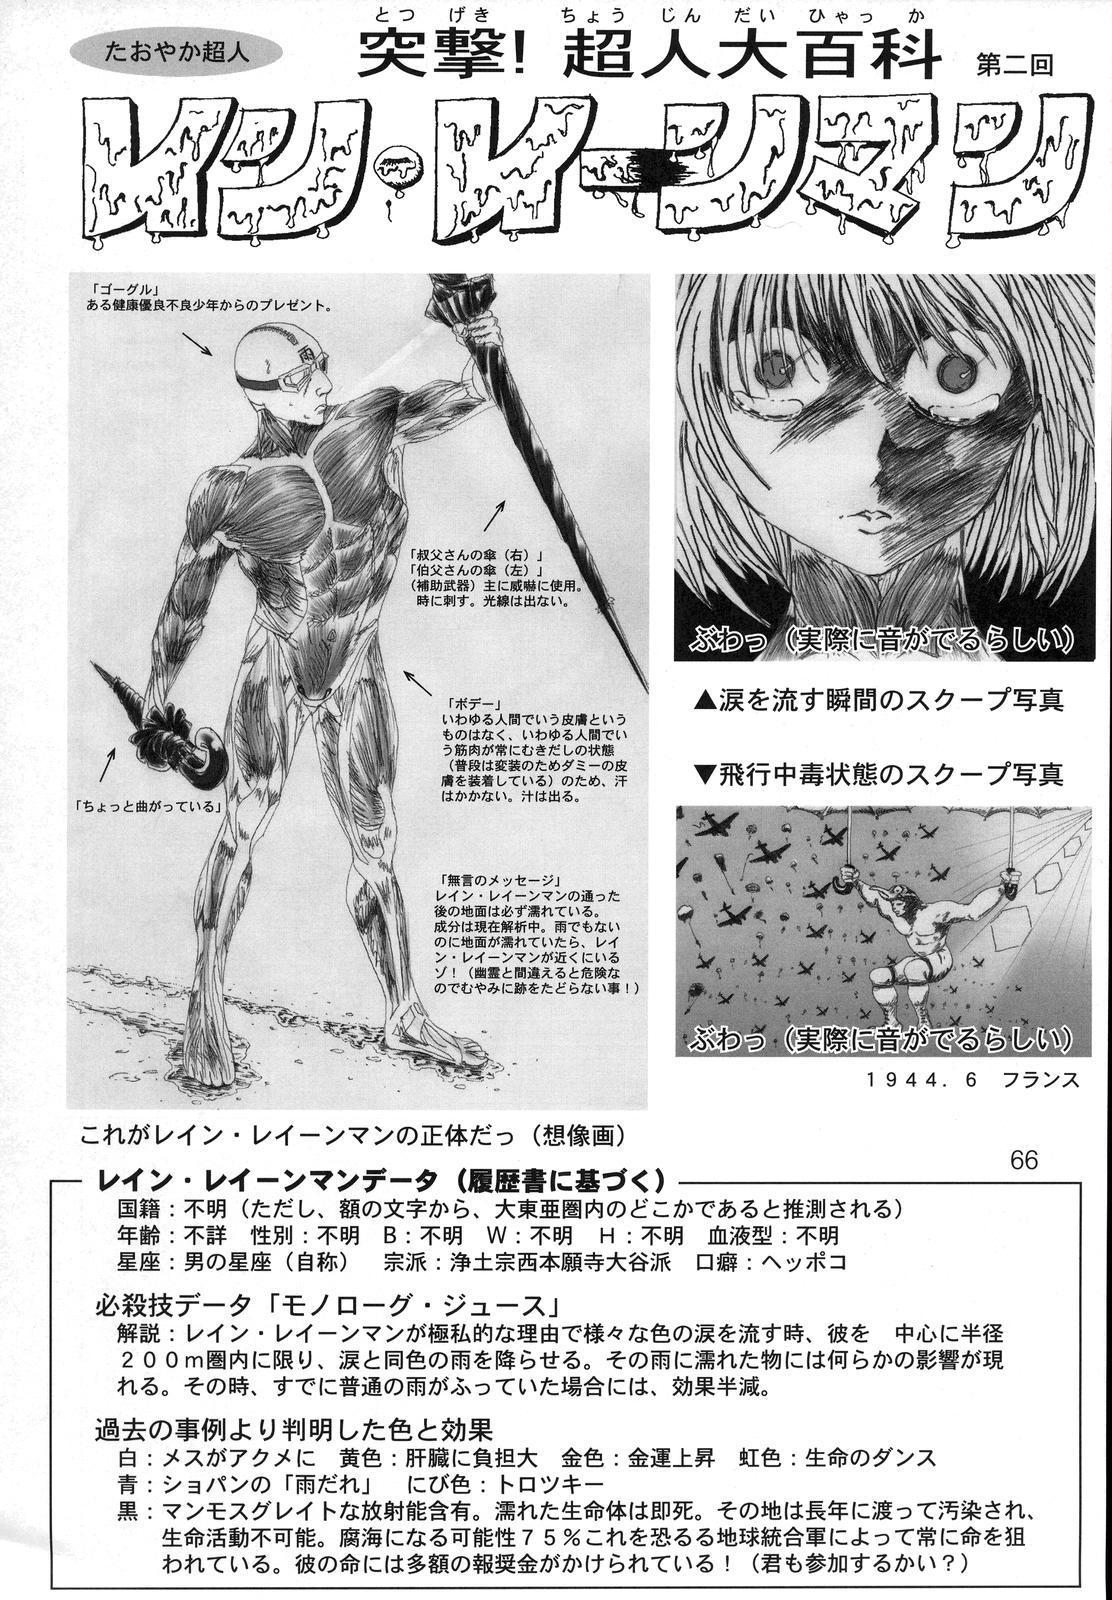 Kikan Yumi Ichirou vol.1~3 Soushuuhen + Alpha 64